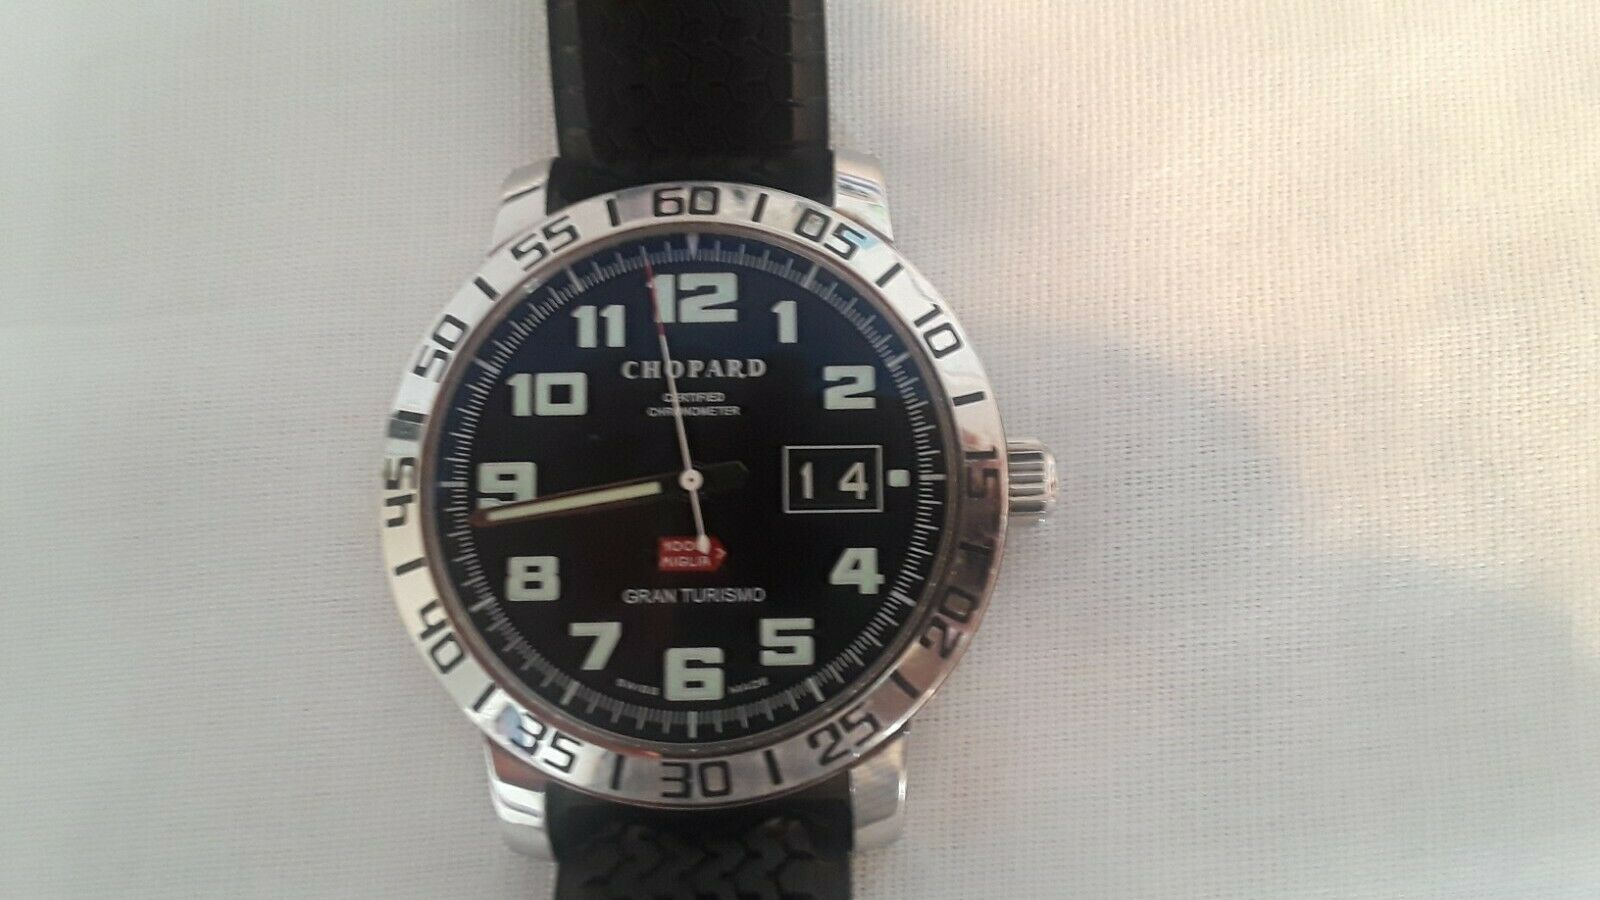 Chopard Men's Mille Miglia Gran Turismo 8955 Steel 41MM Date w/ Box & Papers - watch picture 1